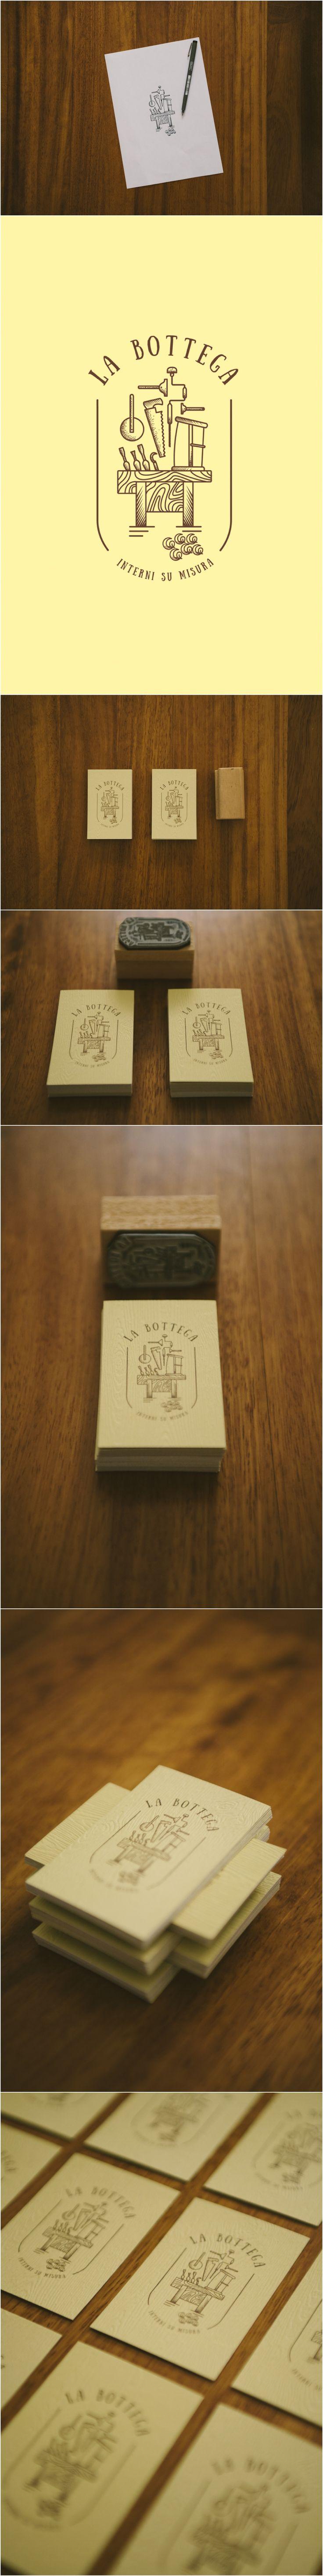 Brand identity and logo design wood inspired